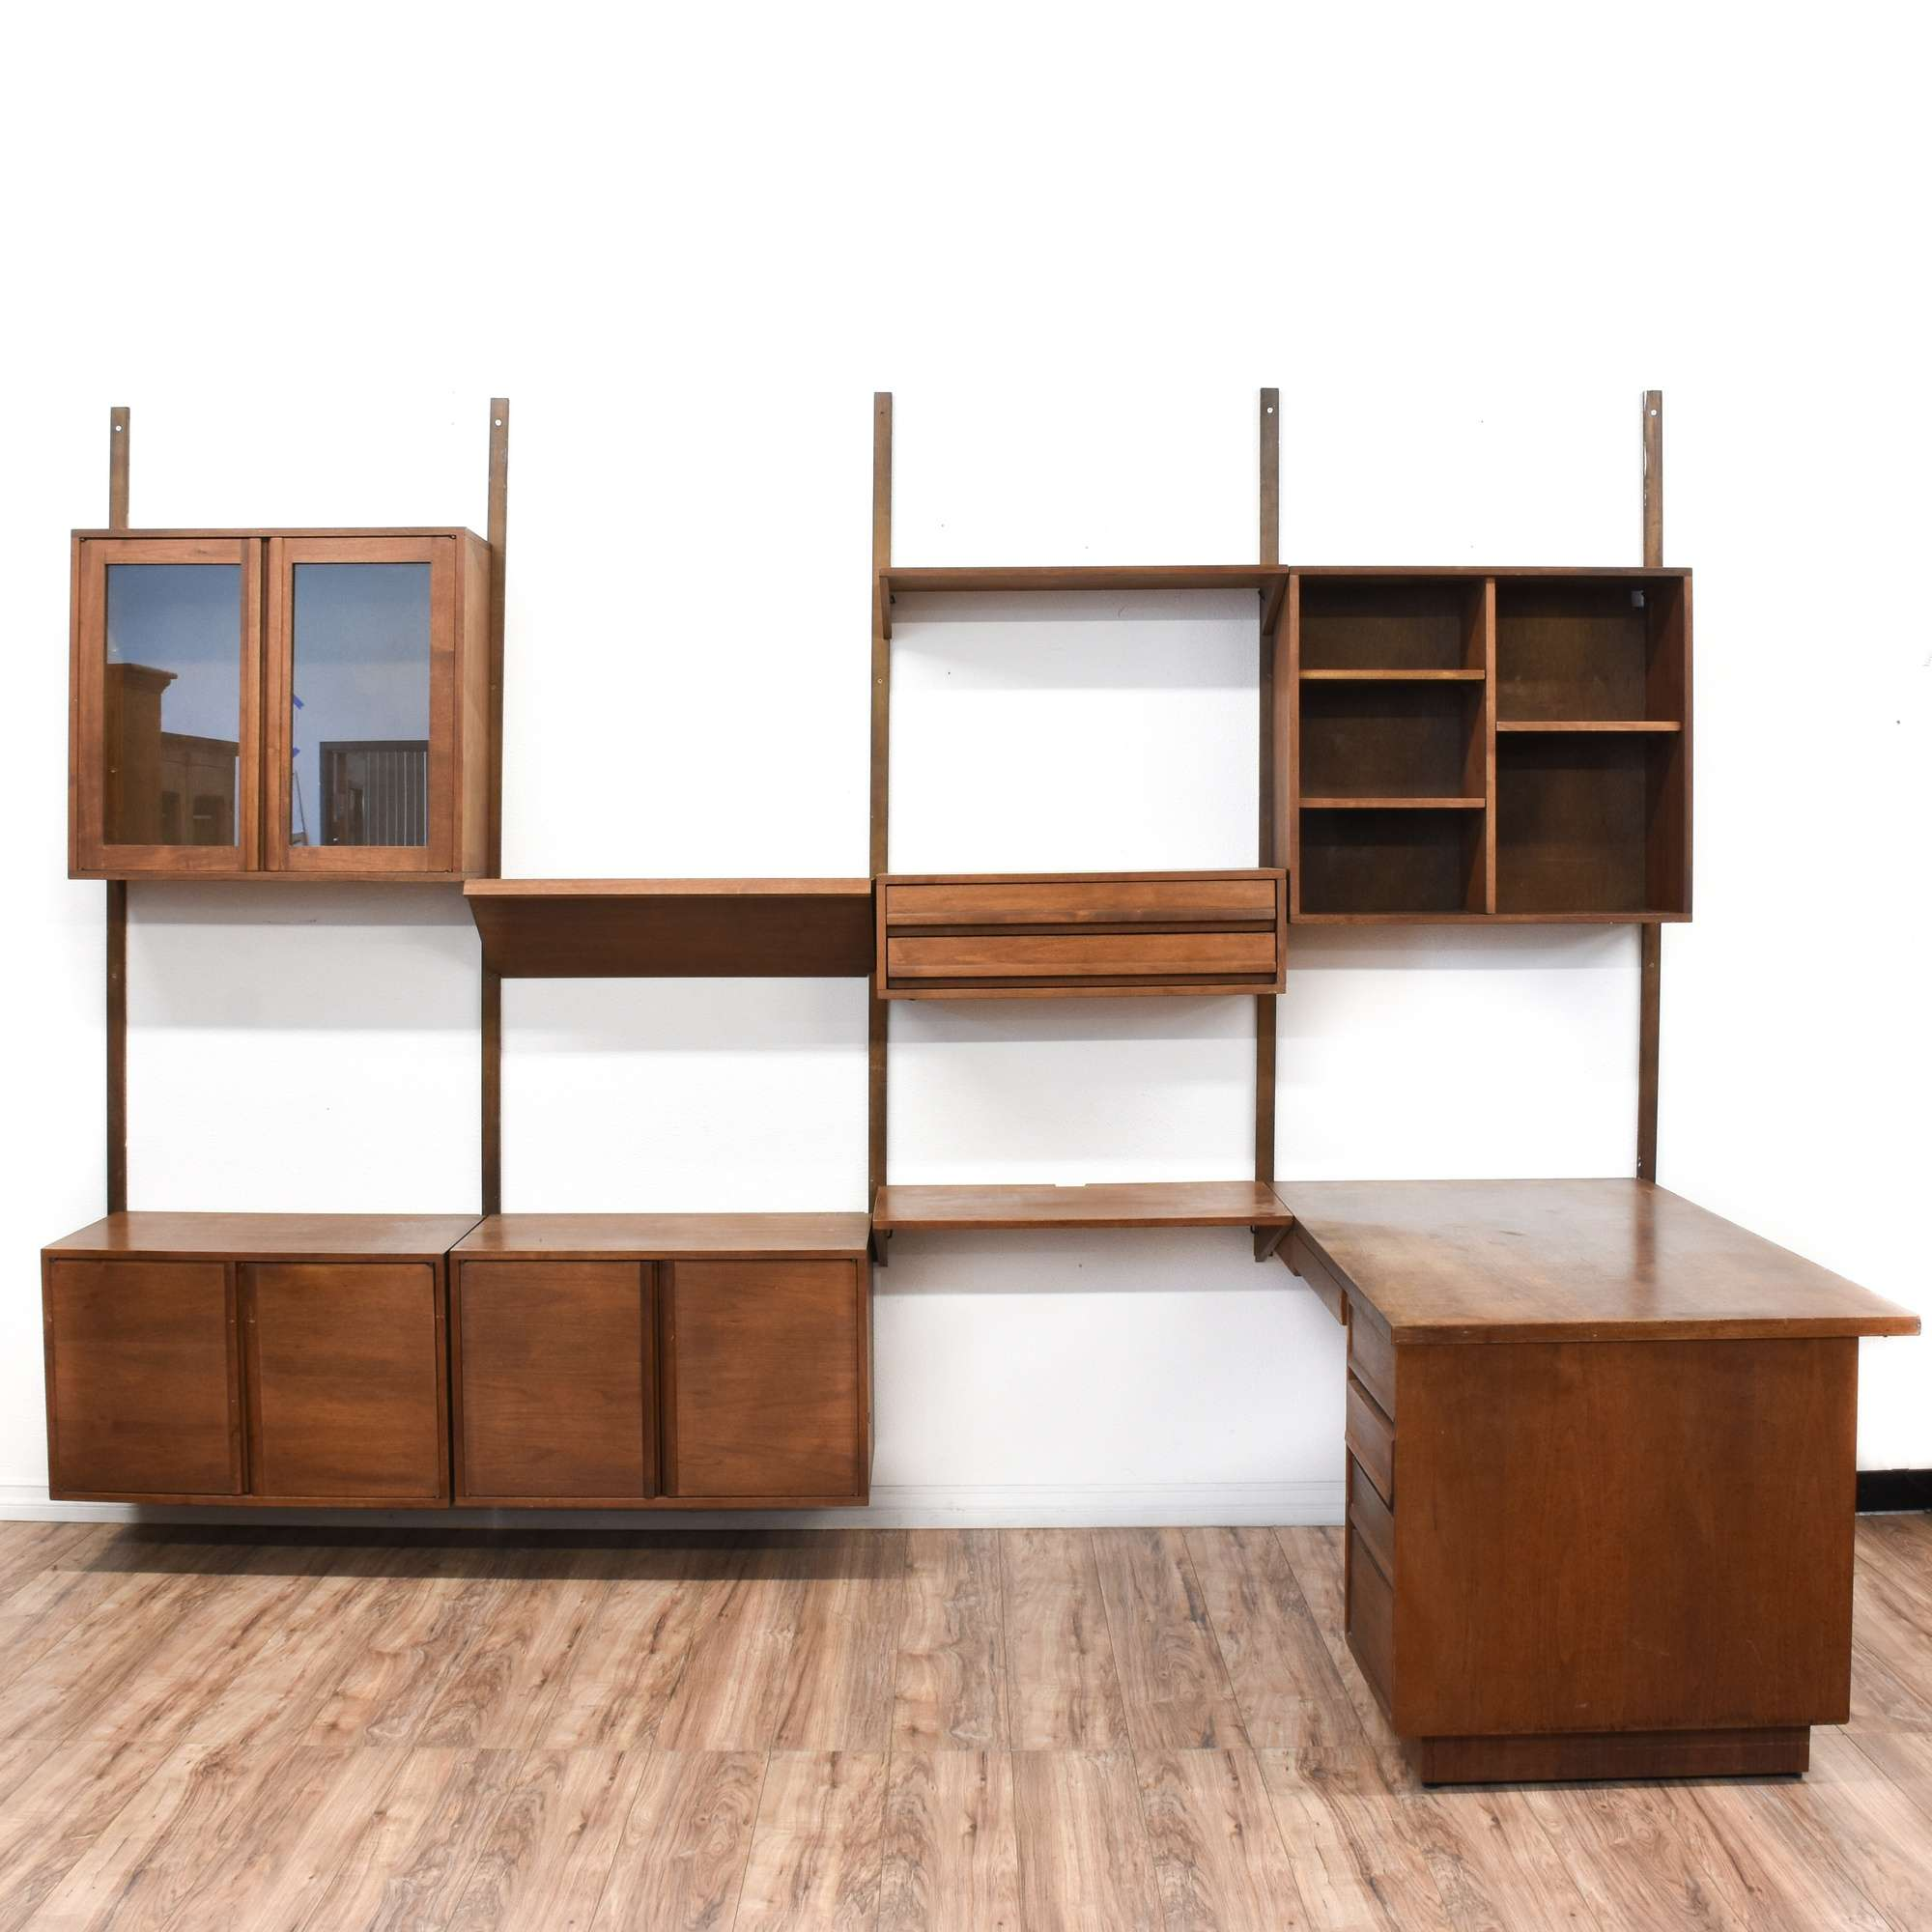 Image of: Mid Century Modern Wall Unit Cabinet Shelf W Desk Loveseat Online Auctions San Diego